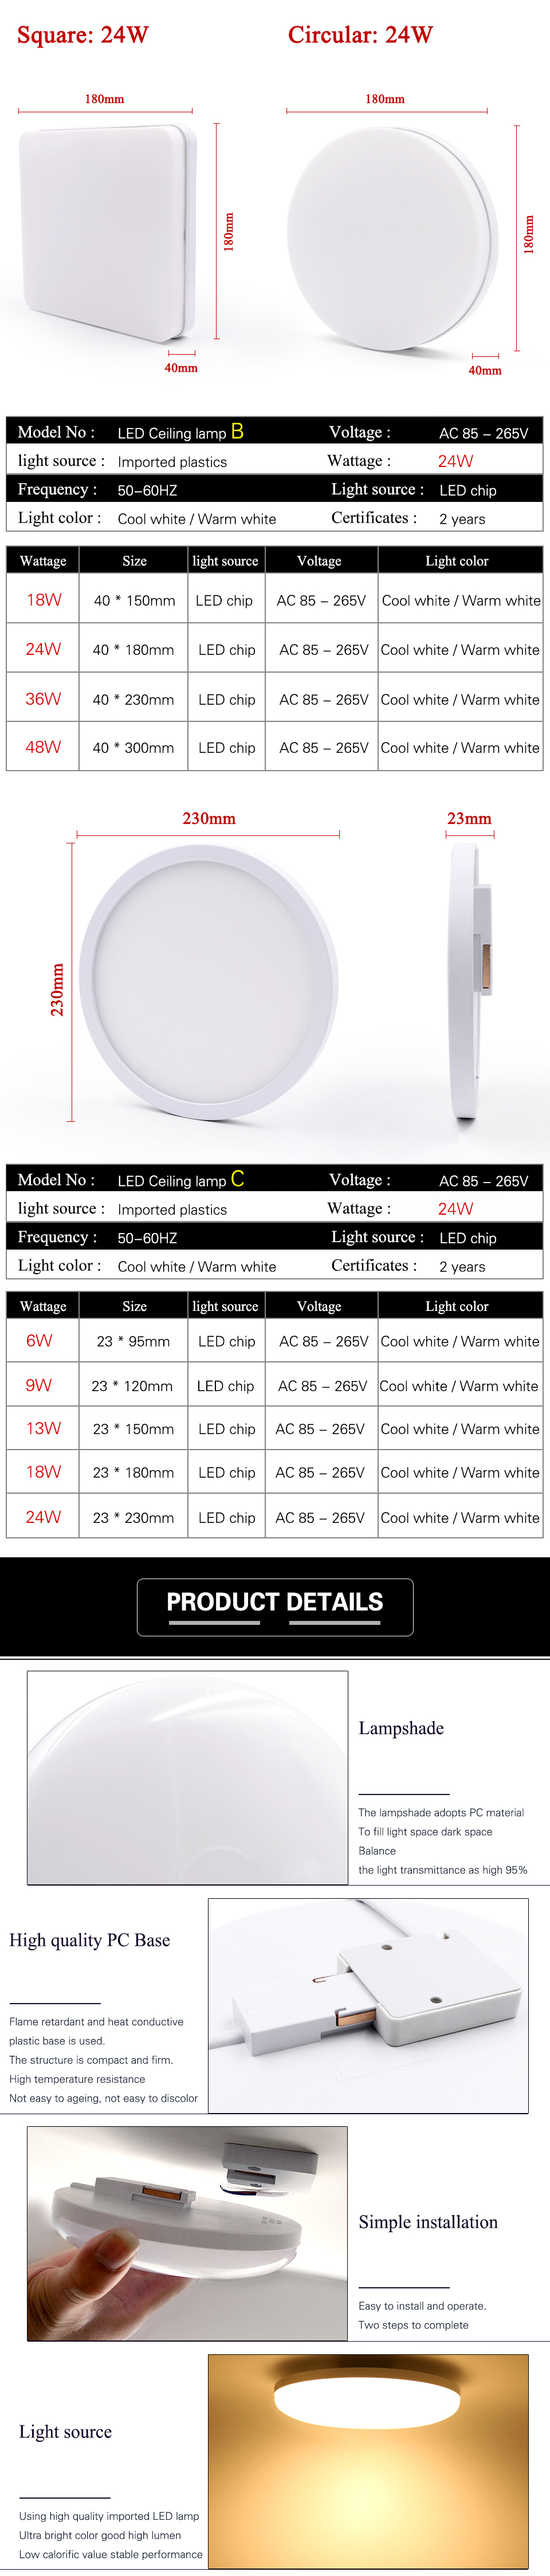 Hb211f54aaf514ad881ae4a151c5936faC EnwYe 6W 9W 13W 18W 24W 36W 48W LED Circular Panel Light Surface Mounted led ceiling light AC 85-265V lampada led lamp